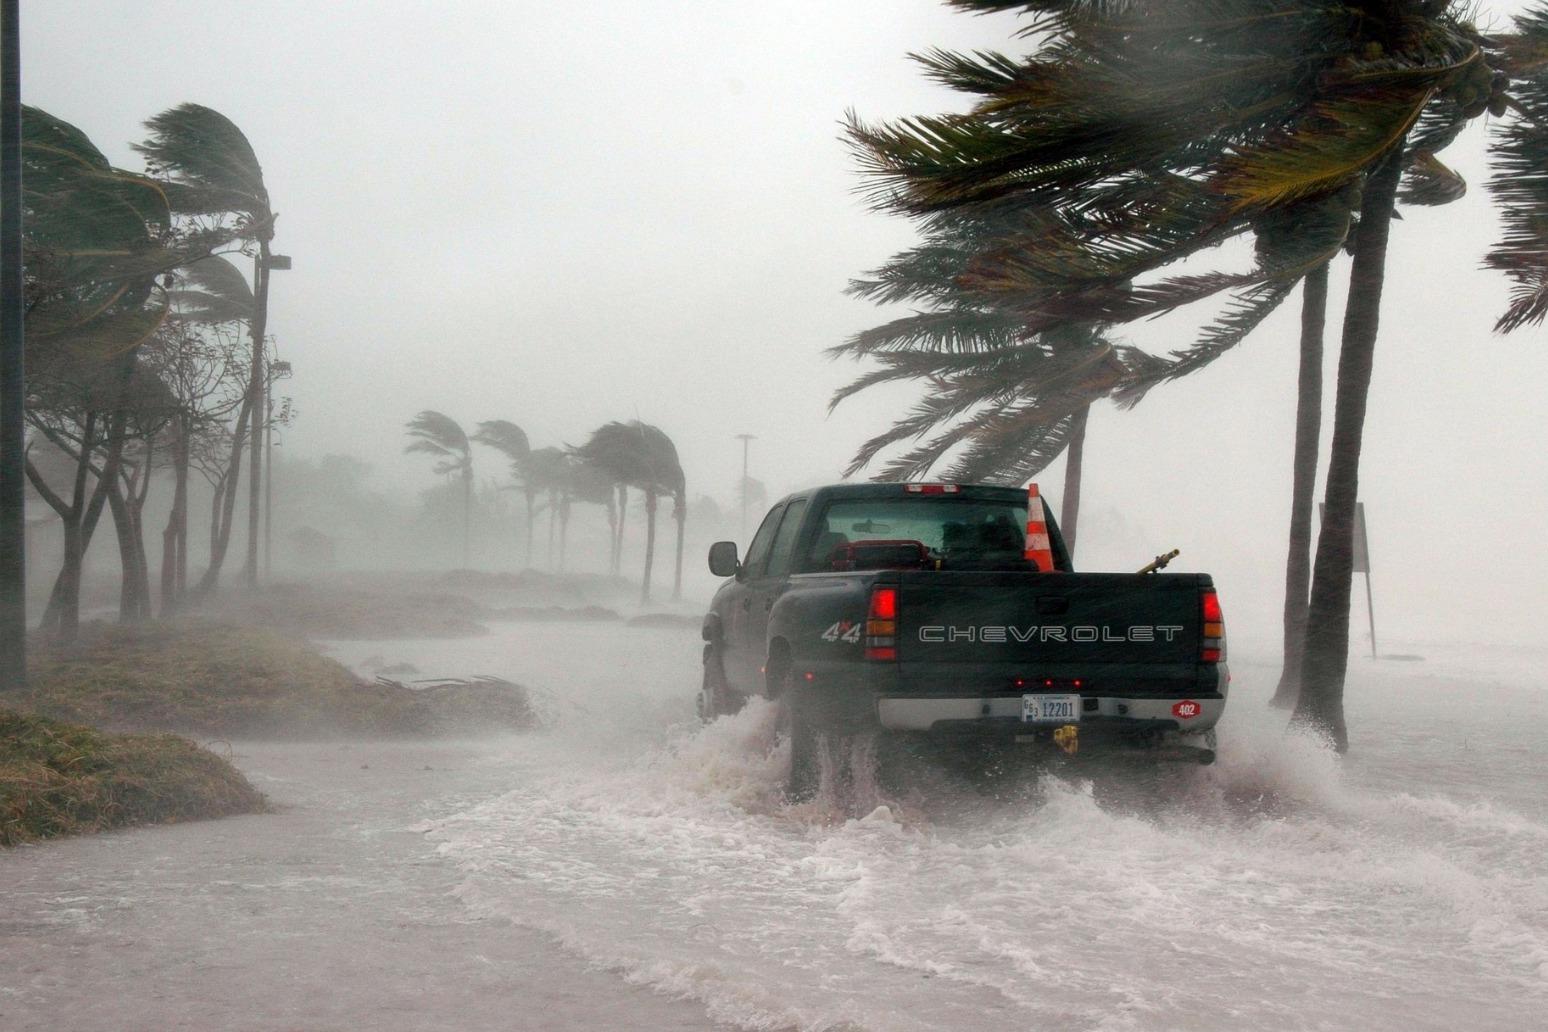 Hurricane Michael plows inland, leaving devastation behind